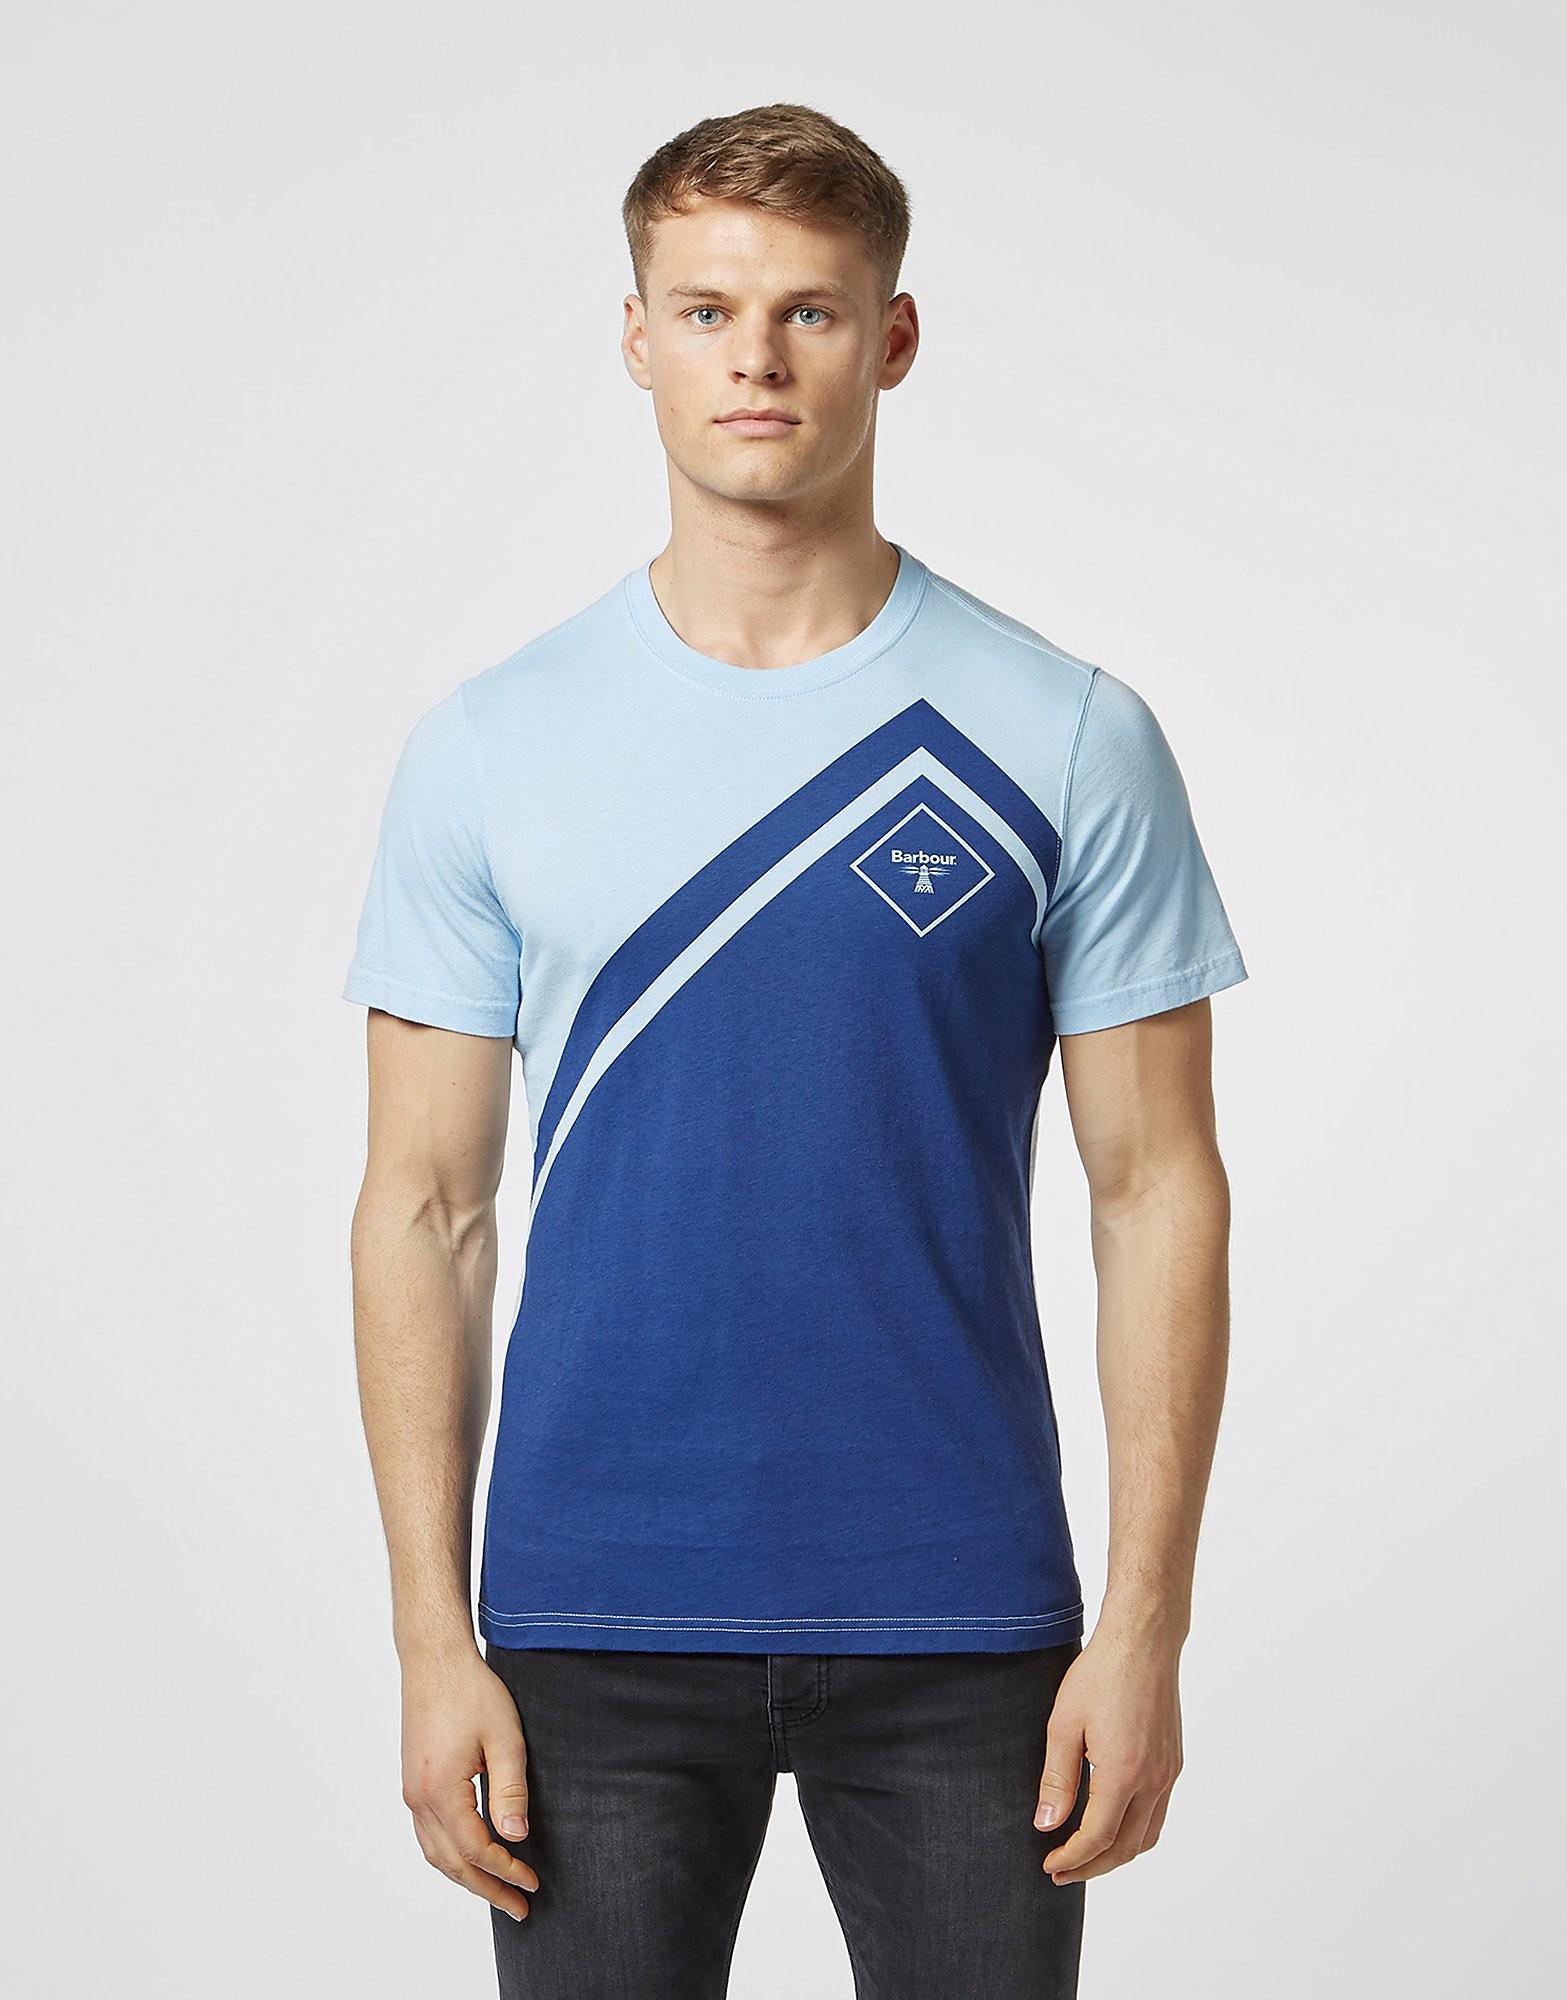 Barbour Beacon Lynch Short Sleeve T-Shirt